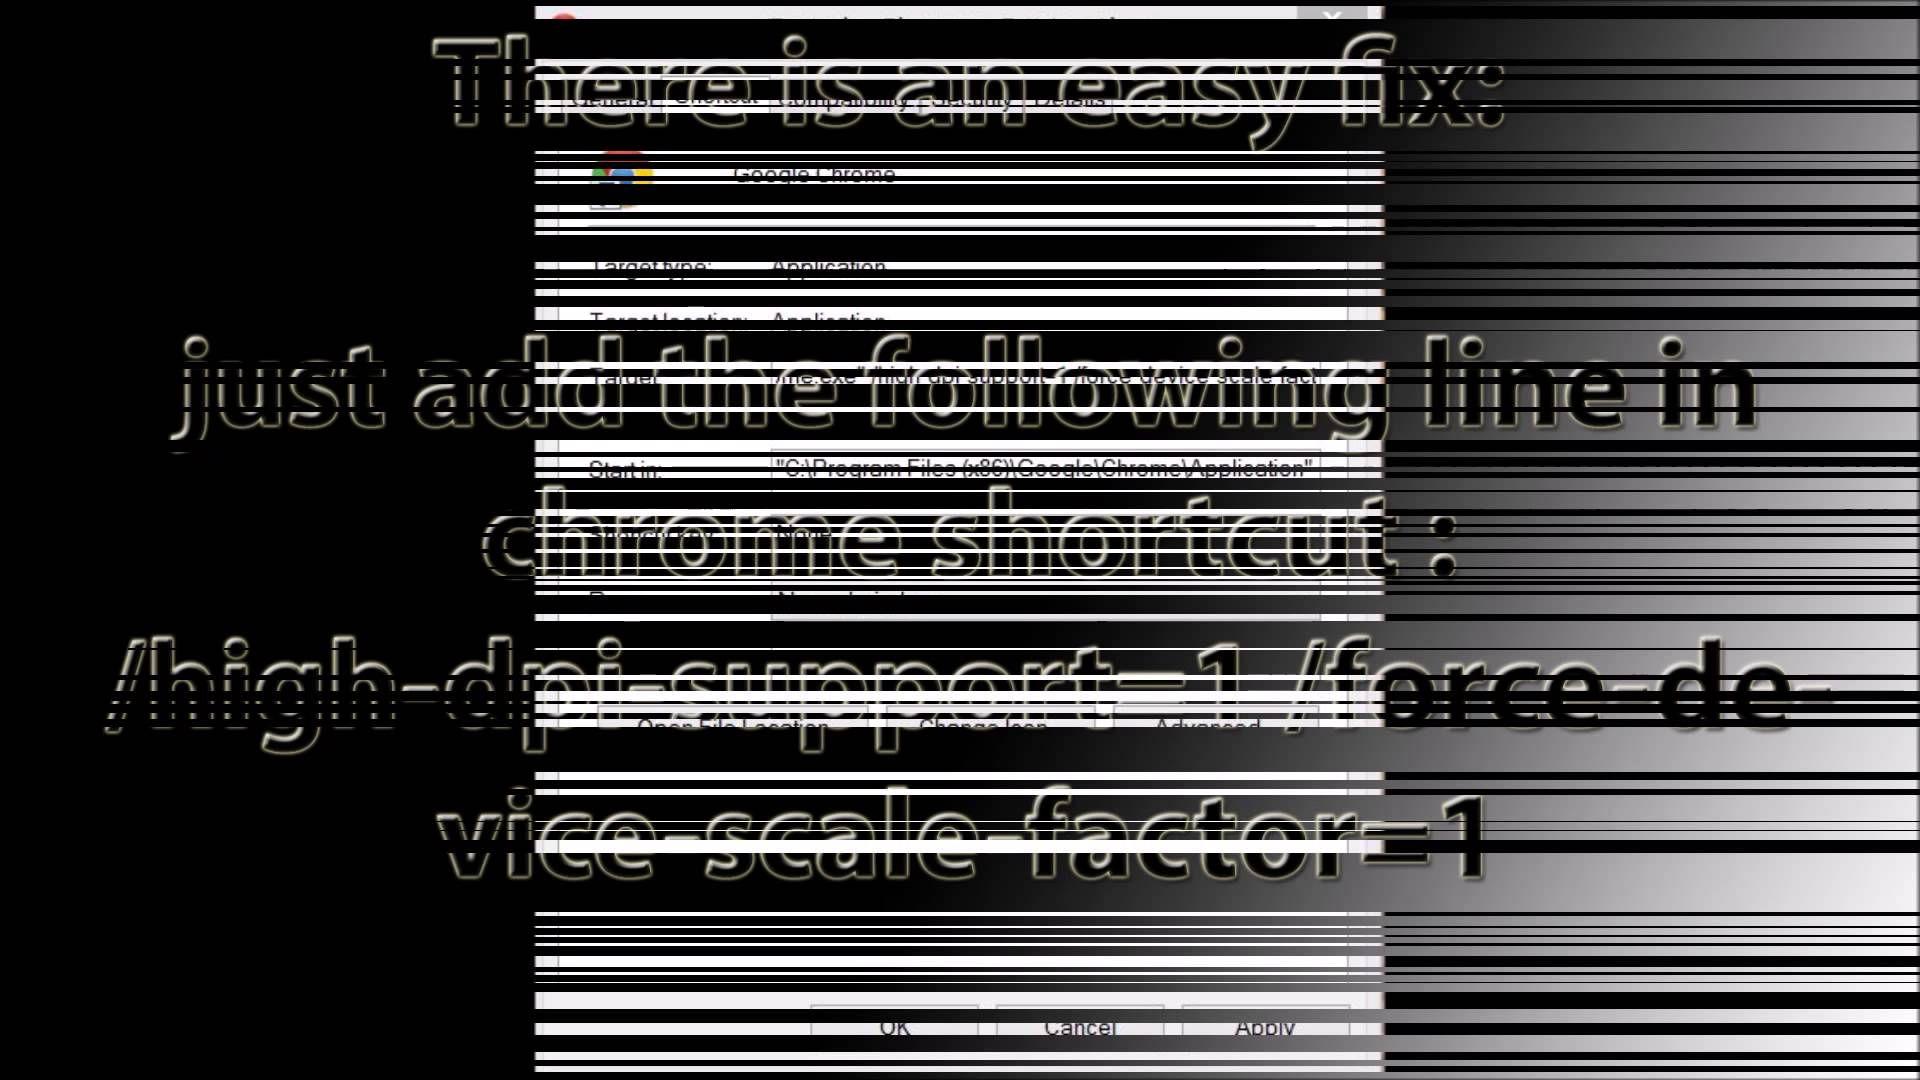 ff61a7dc463caa749c40dd8218d51264